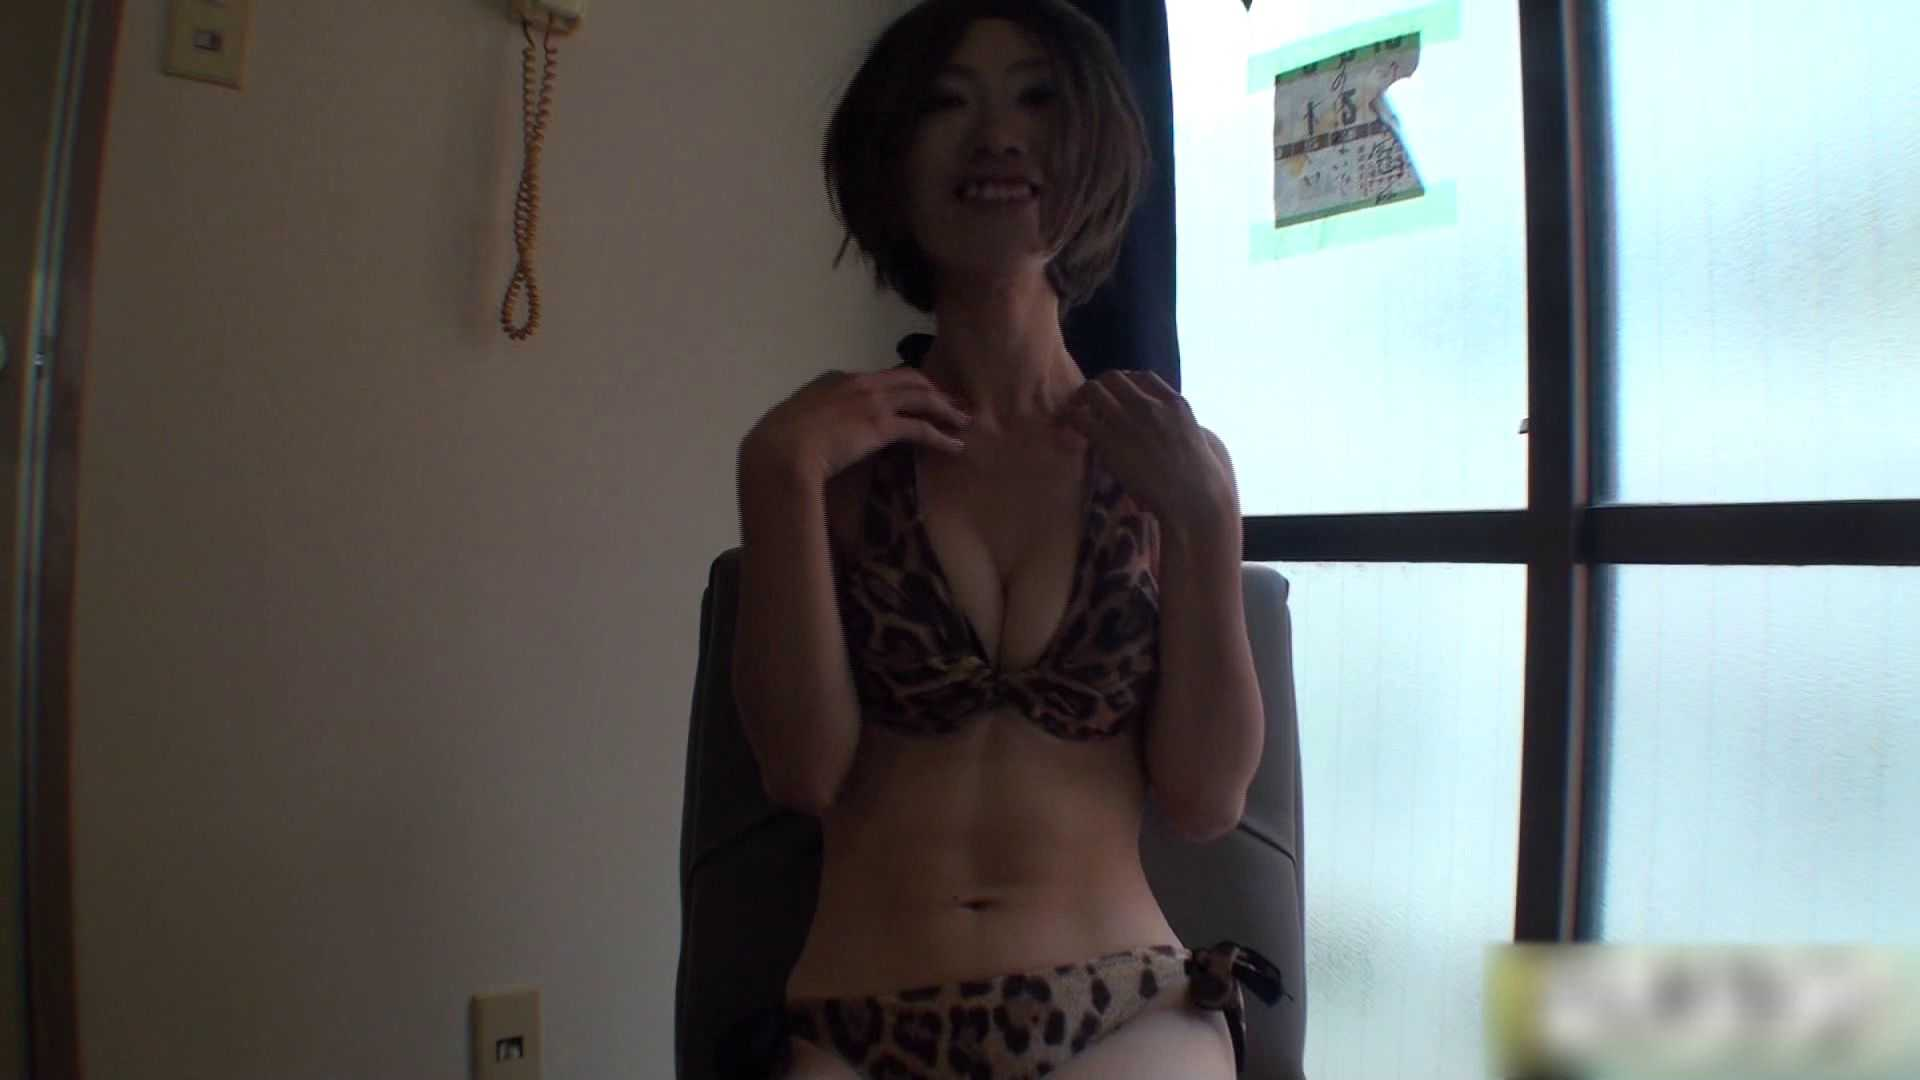 S級厳選美女ビッチガールVol.46 エッチなセックス おまんこ動画流出 60画像 2